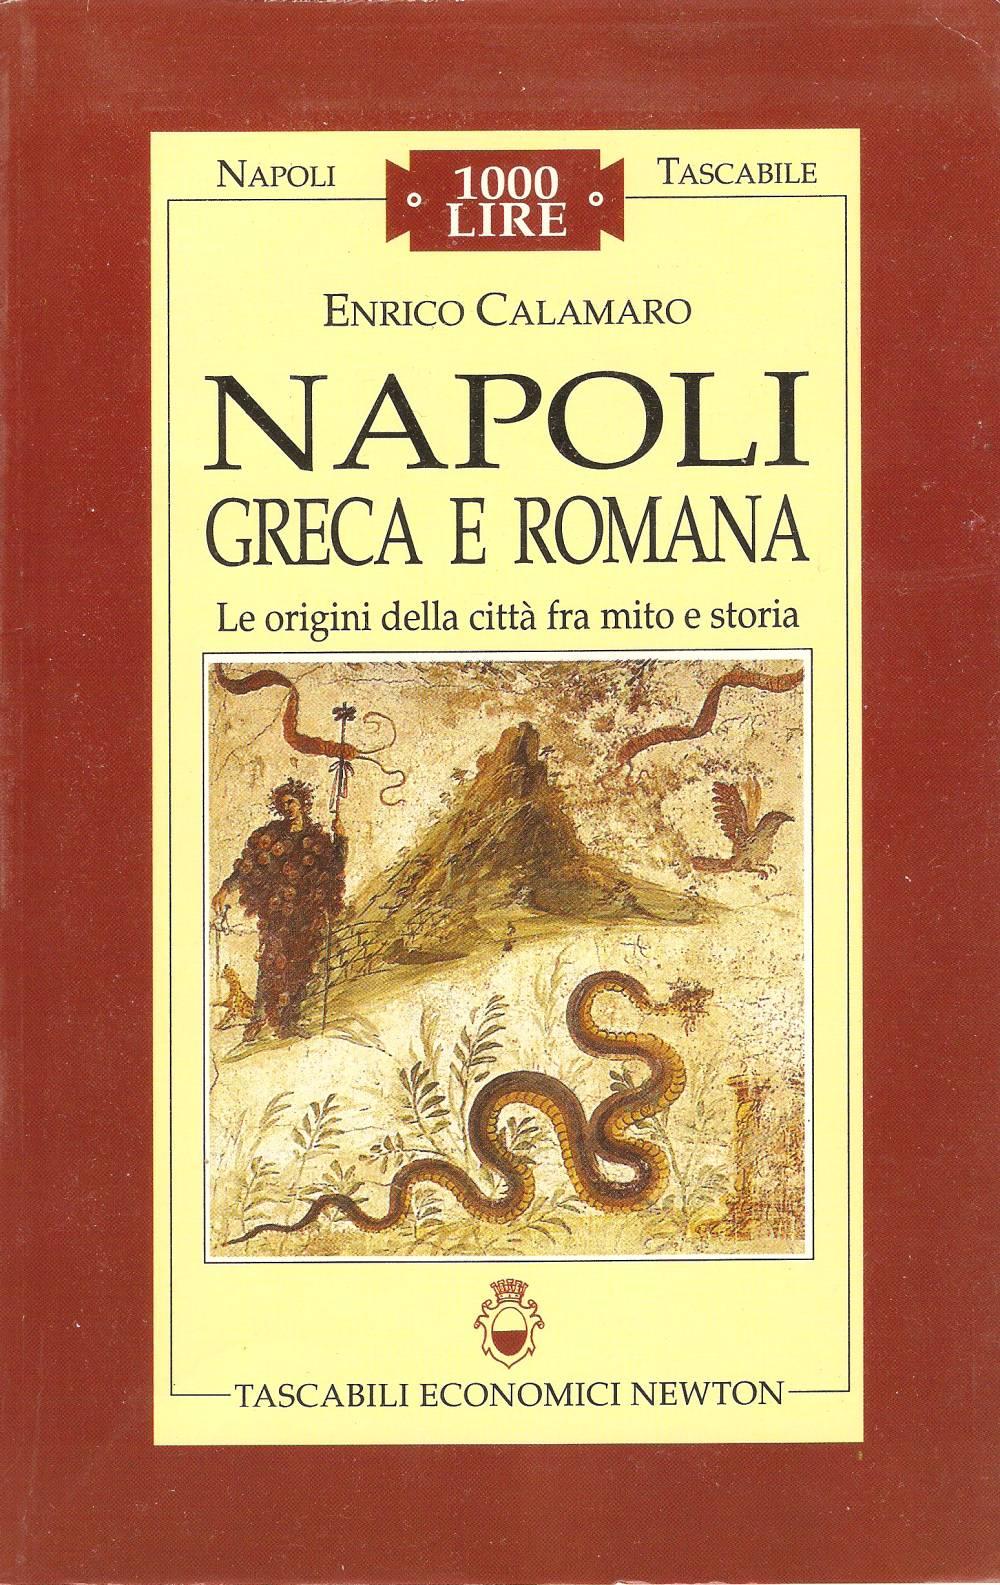 Napoli greca e romana